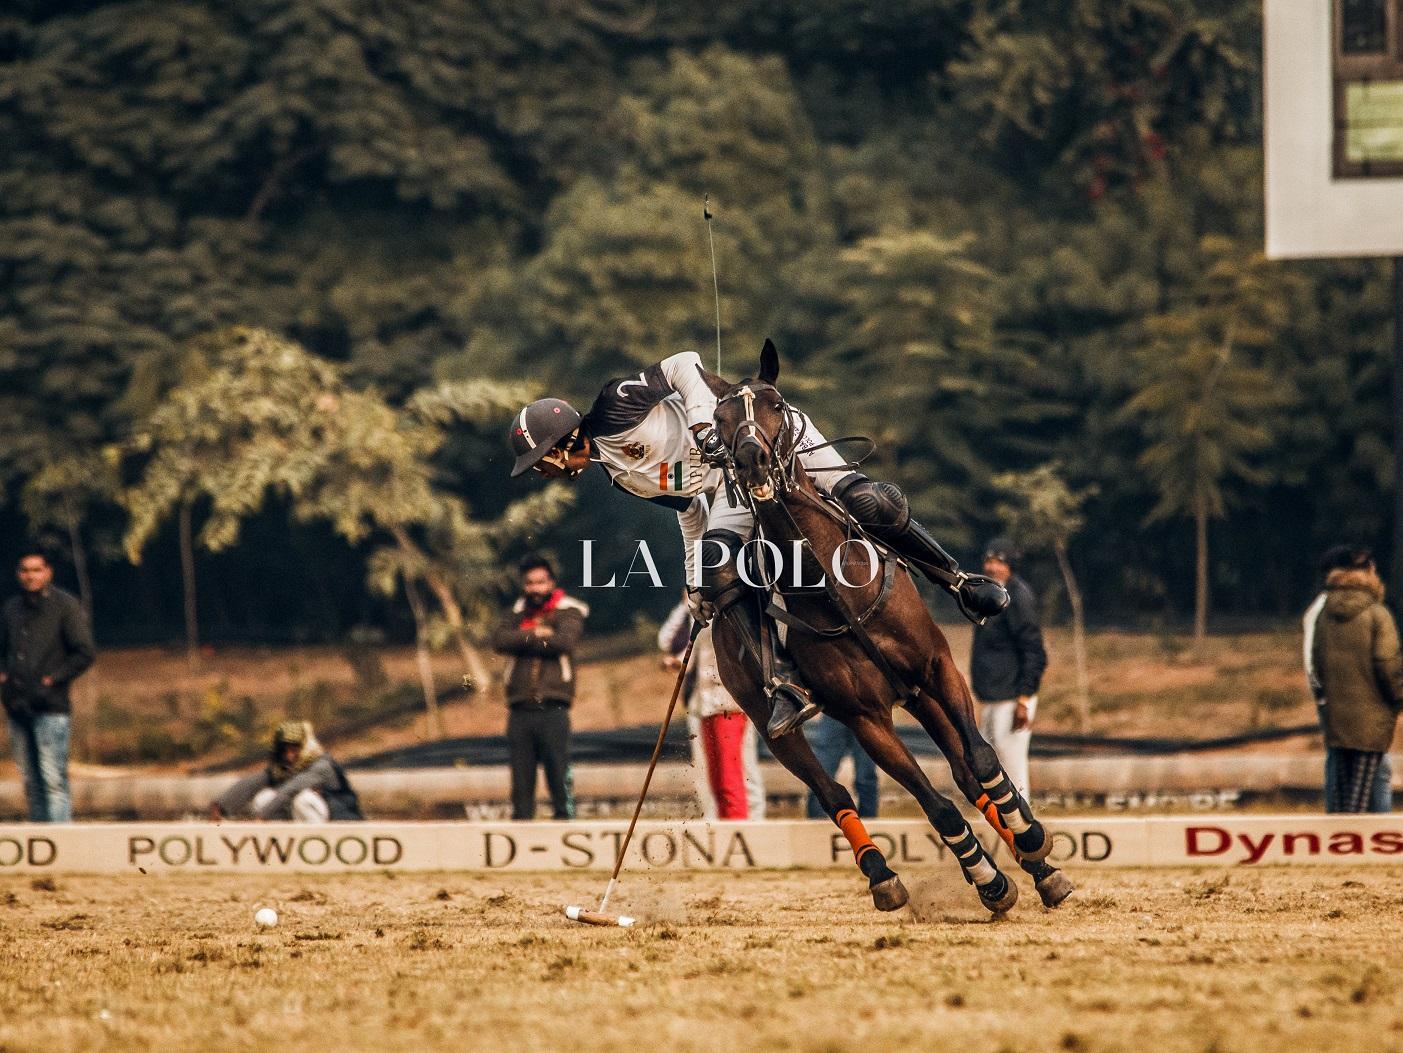 polo_players_in_india_lapolo